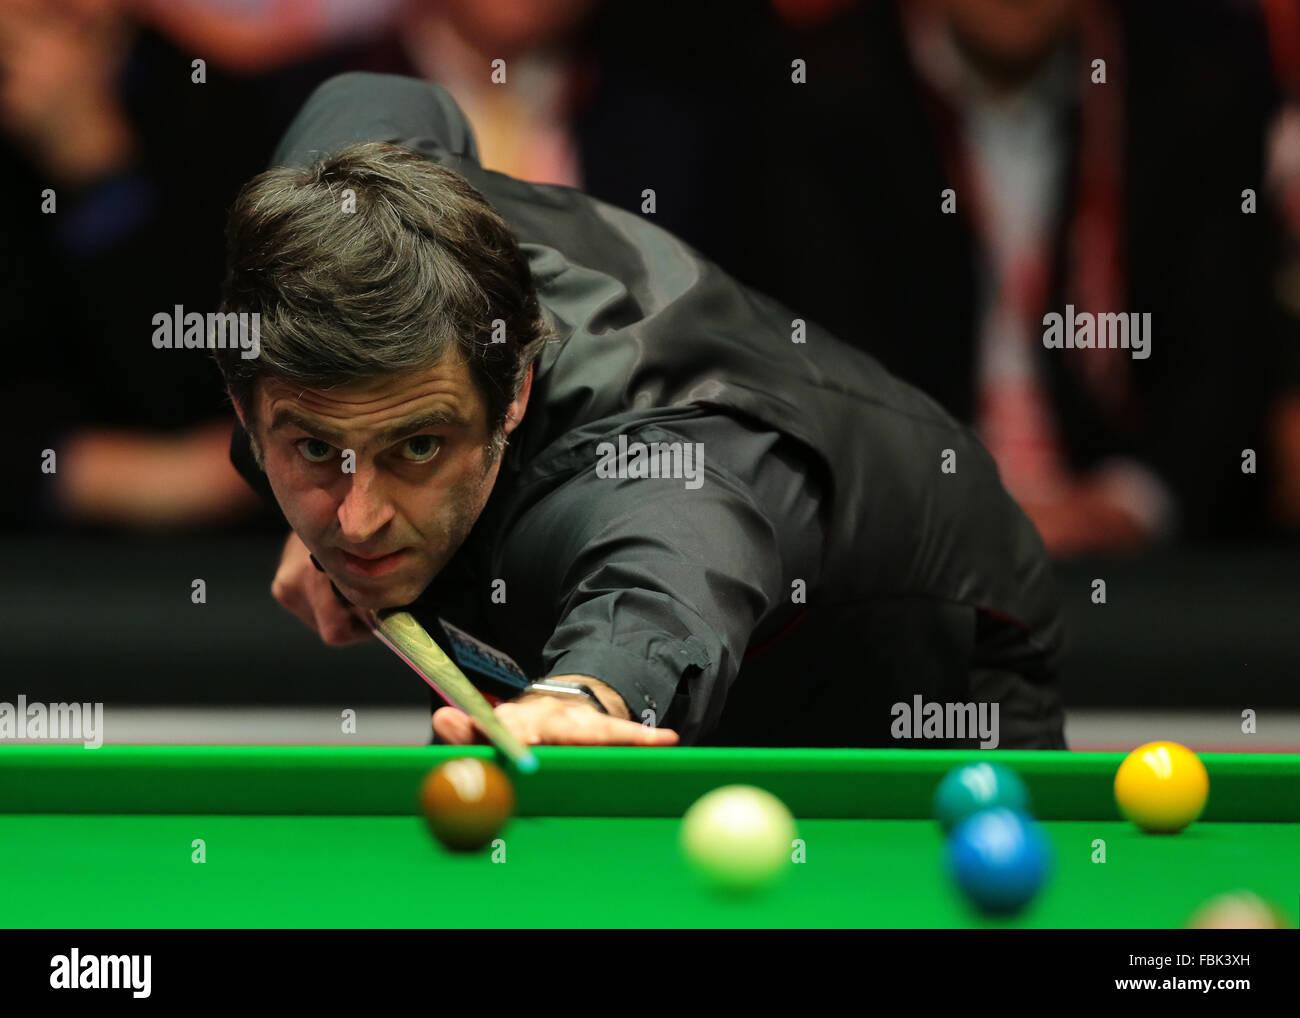 Alexandra Palace, London, UK. 17. Januar 2016. Snooker-Meister. Finale. Ronnie O'Sullivan reagiert während Stockbild